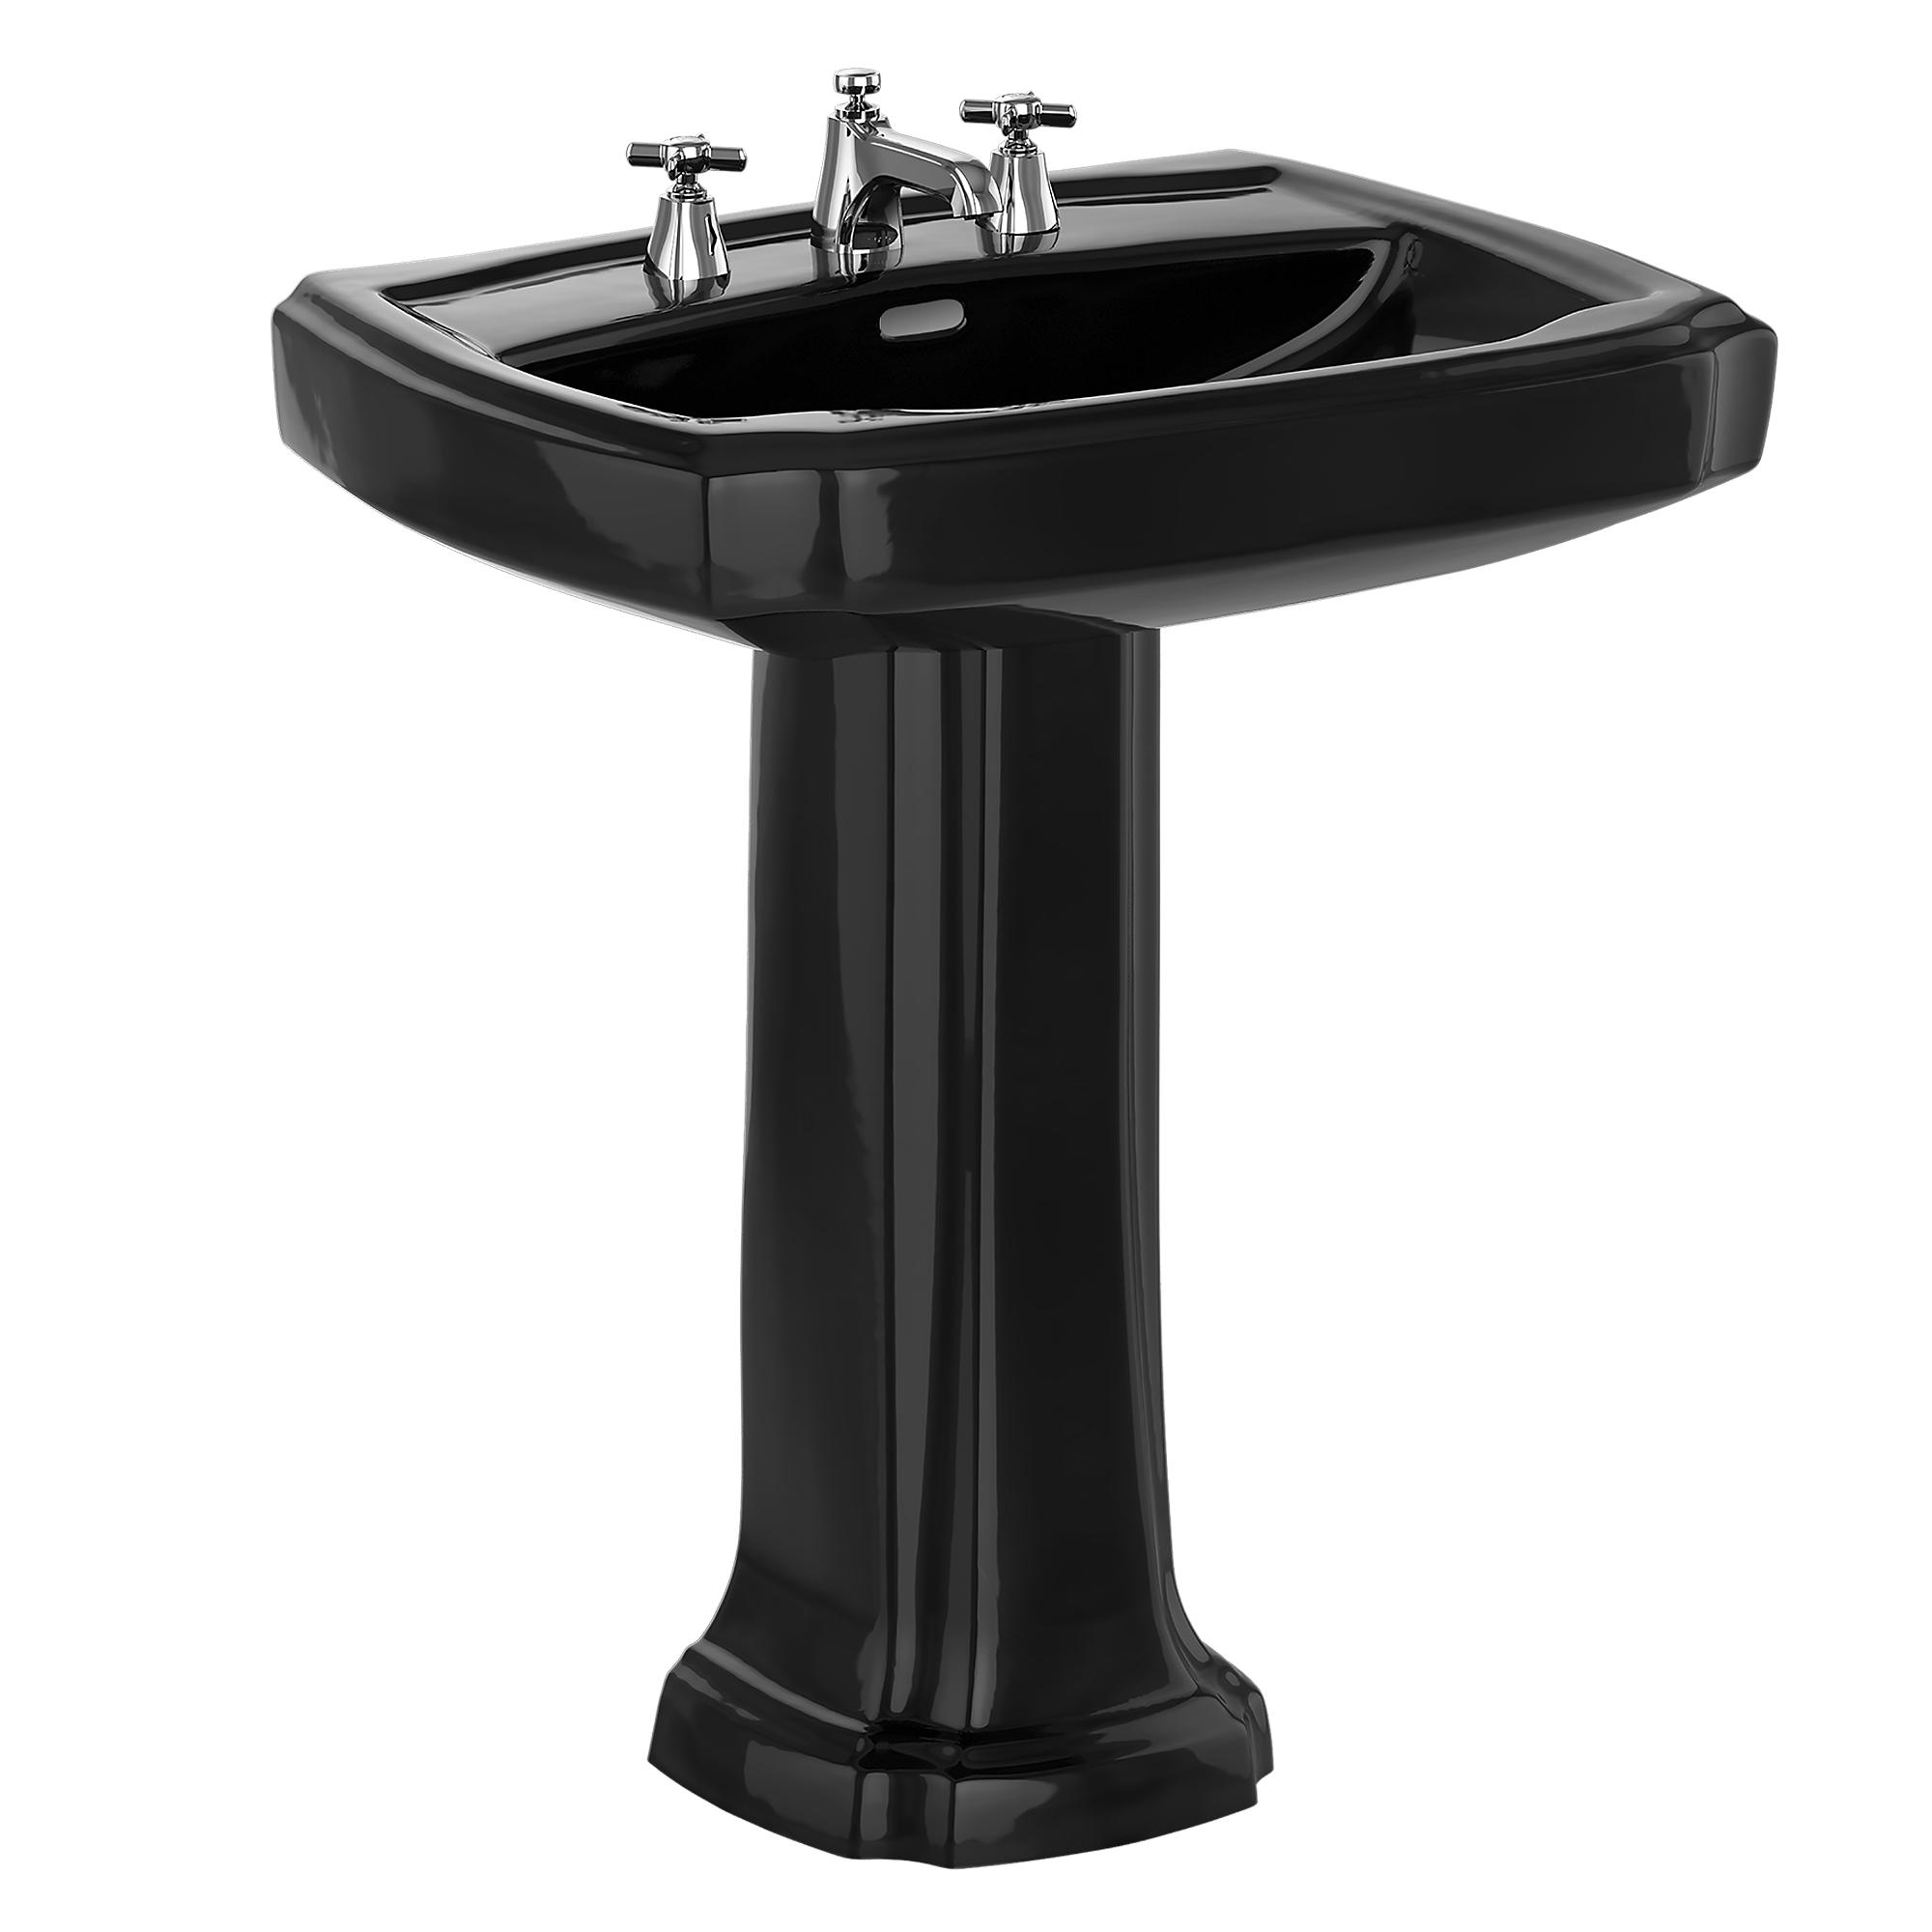 Lpt970 51 guinevere  27  pedestal lavatory 0